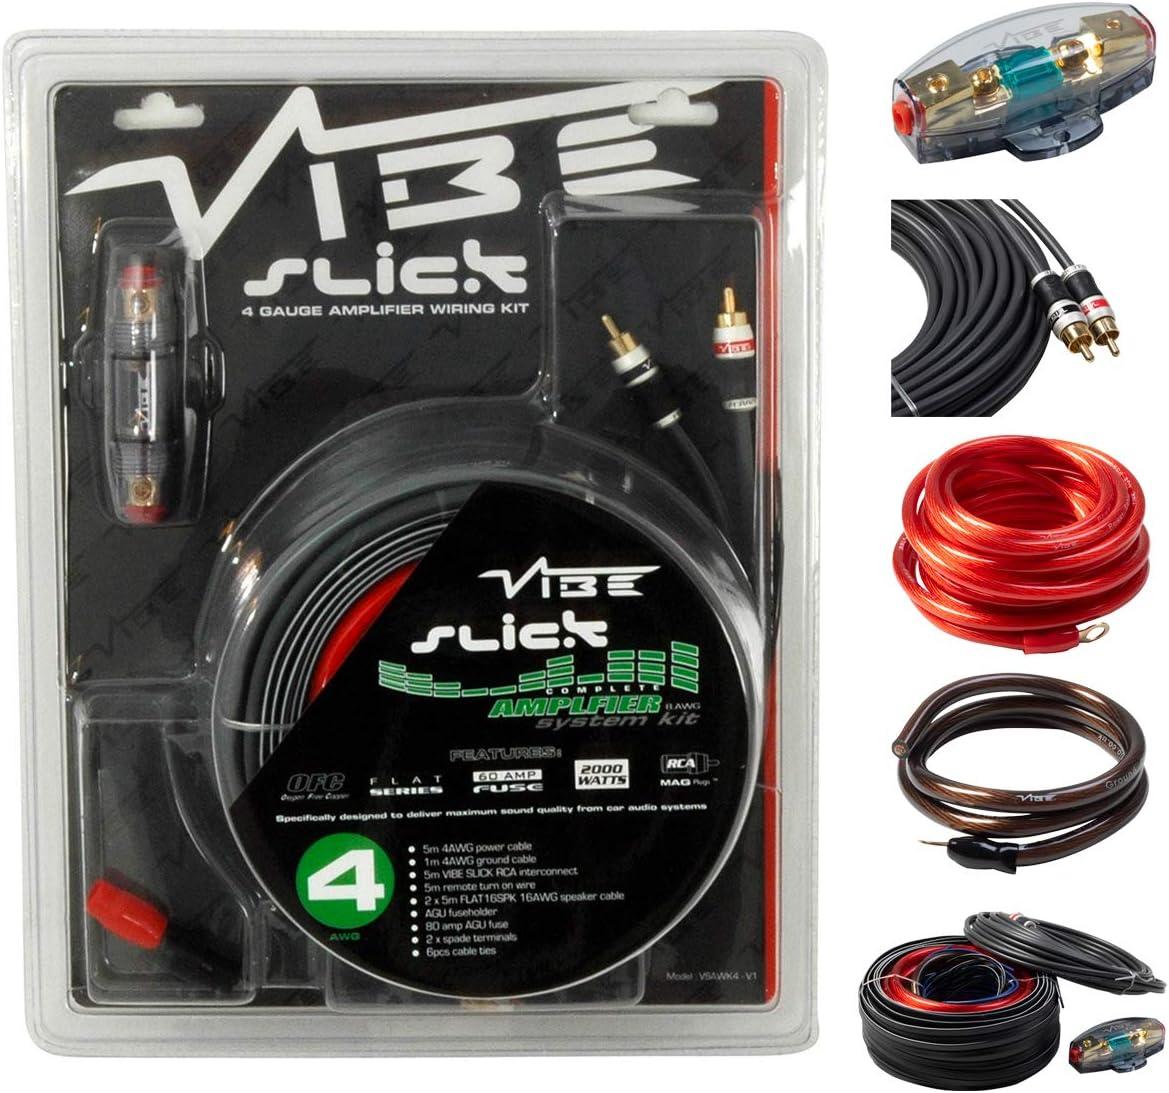 Vibe Audio Slick 2000 W System Car Wiring Kit Elektronik